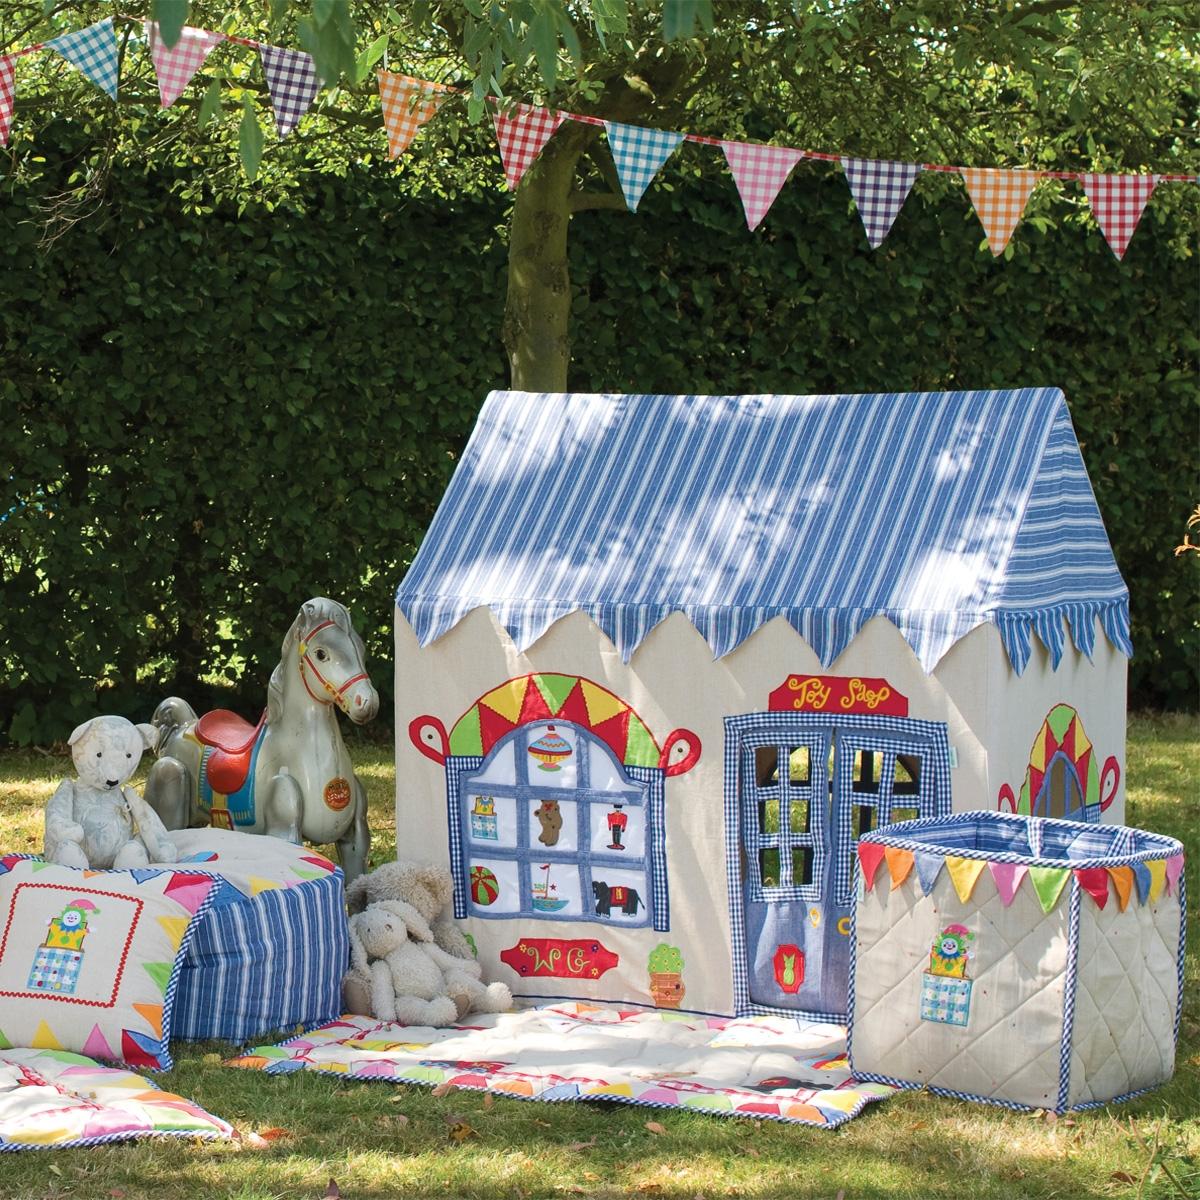 Casette per bambini casette giardino casette per for Amazon casette per bambini